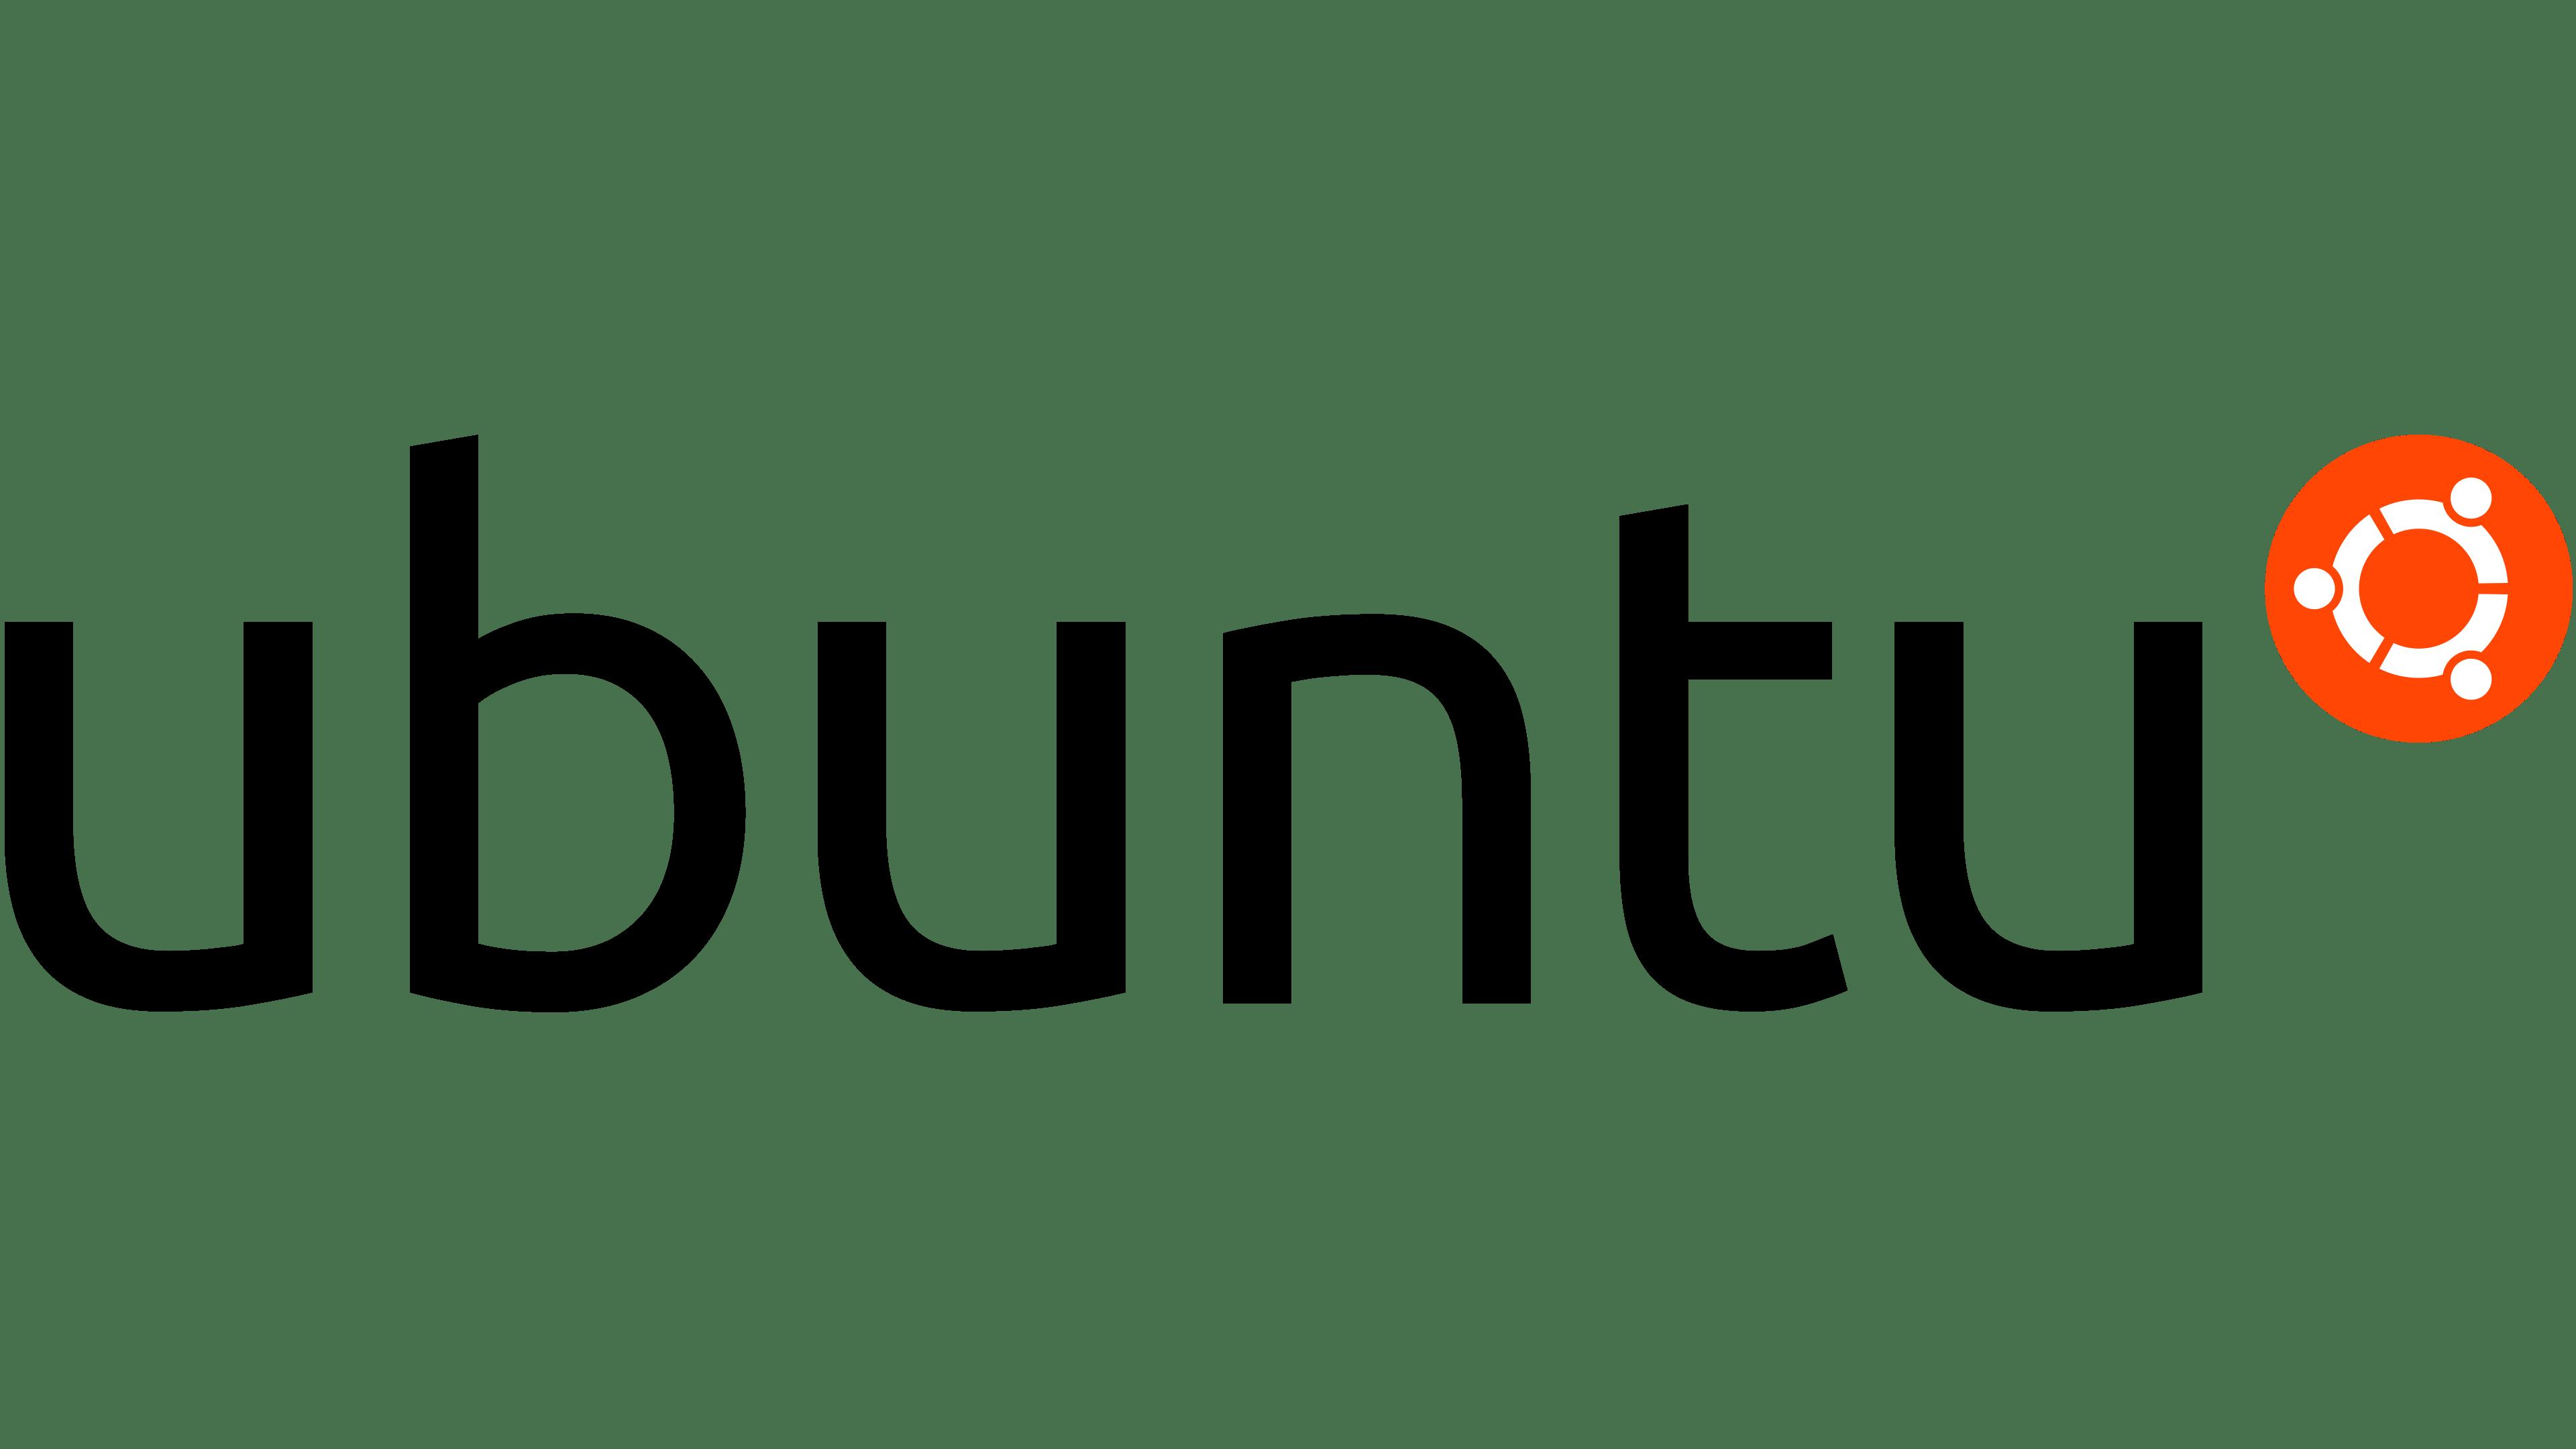 Ubuntu Bedeutung